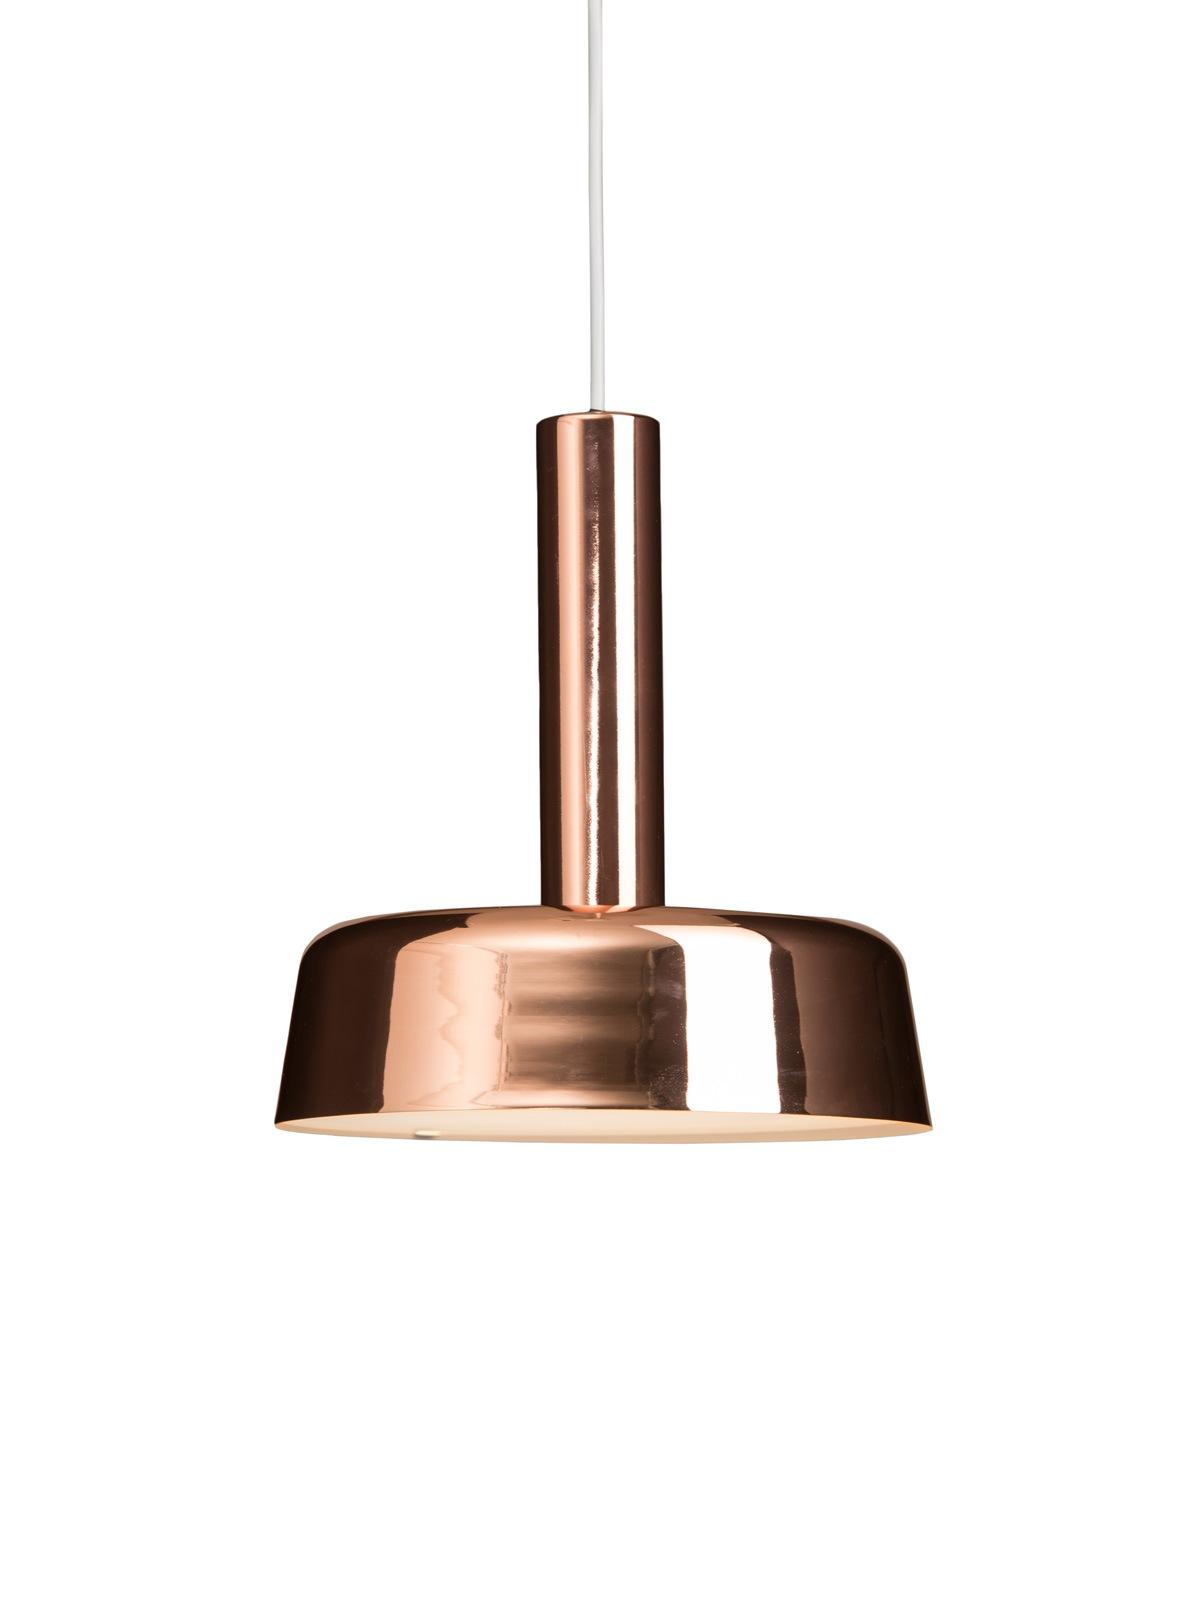 Innolux Cafe Lampe Kupfer DesignOrt Onlineshop Lampen Berlin